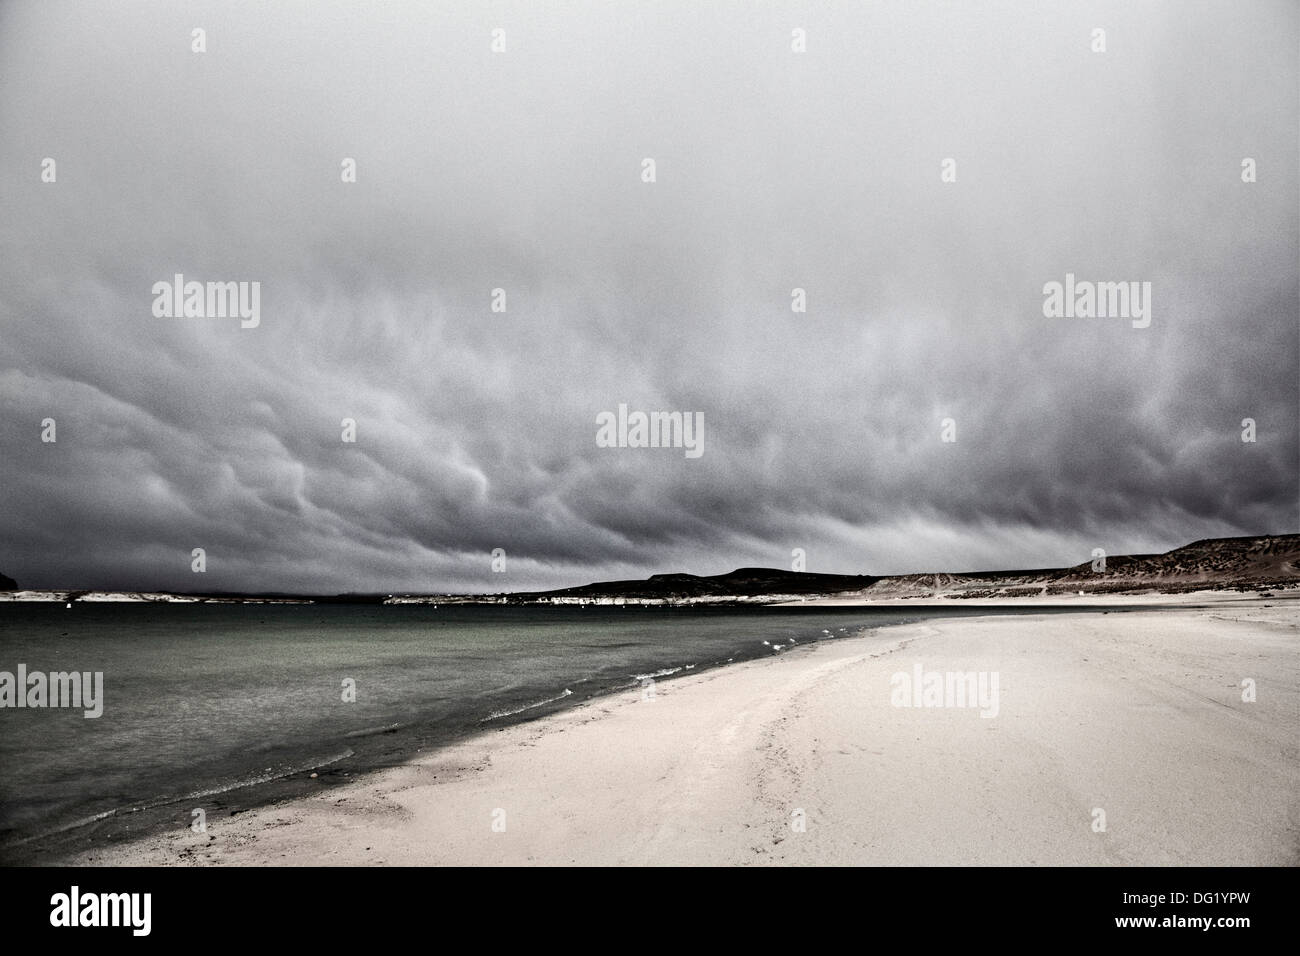 Ominous Gray Clouds Over Sandy Beach, Utah, USA - Stock Image